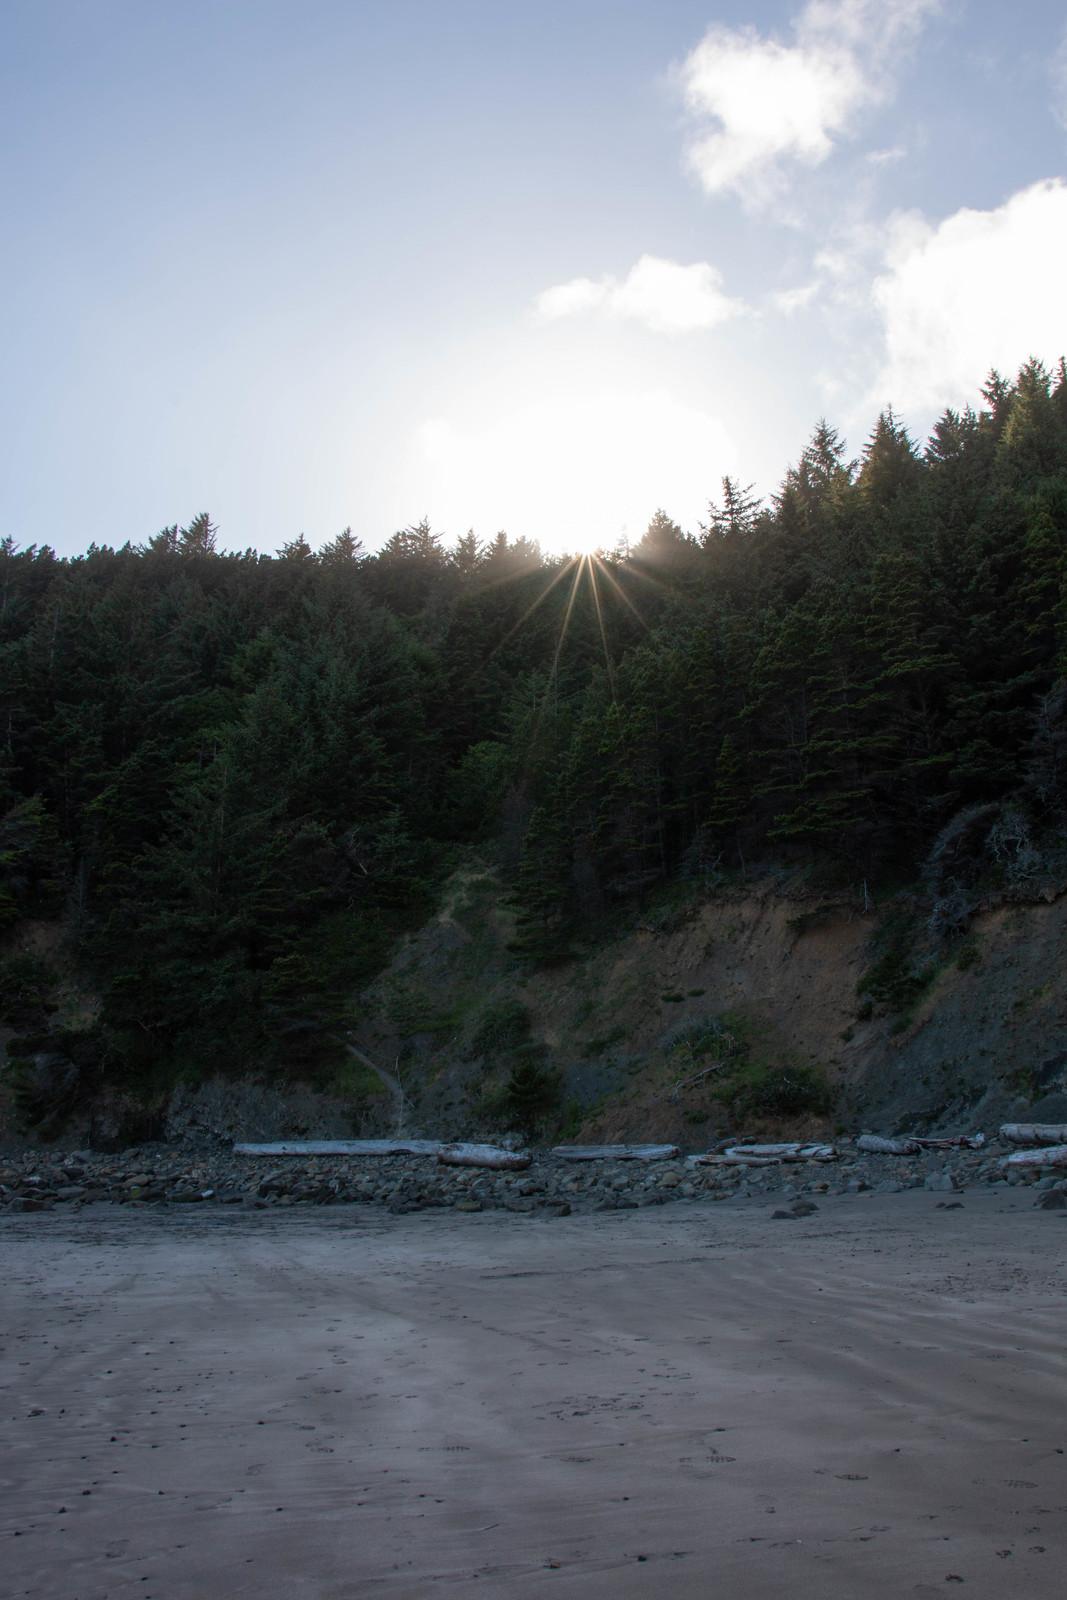 05.26. Oregon